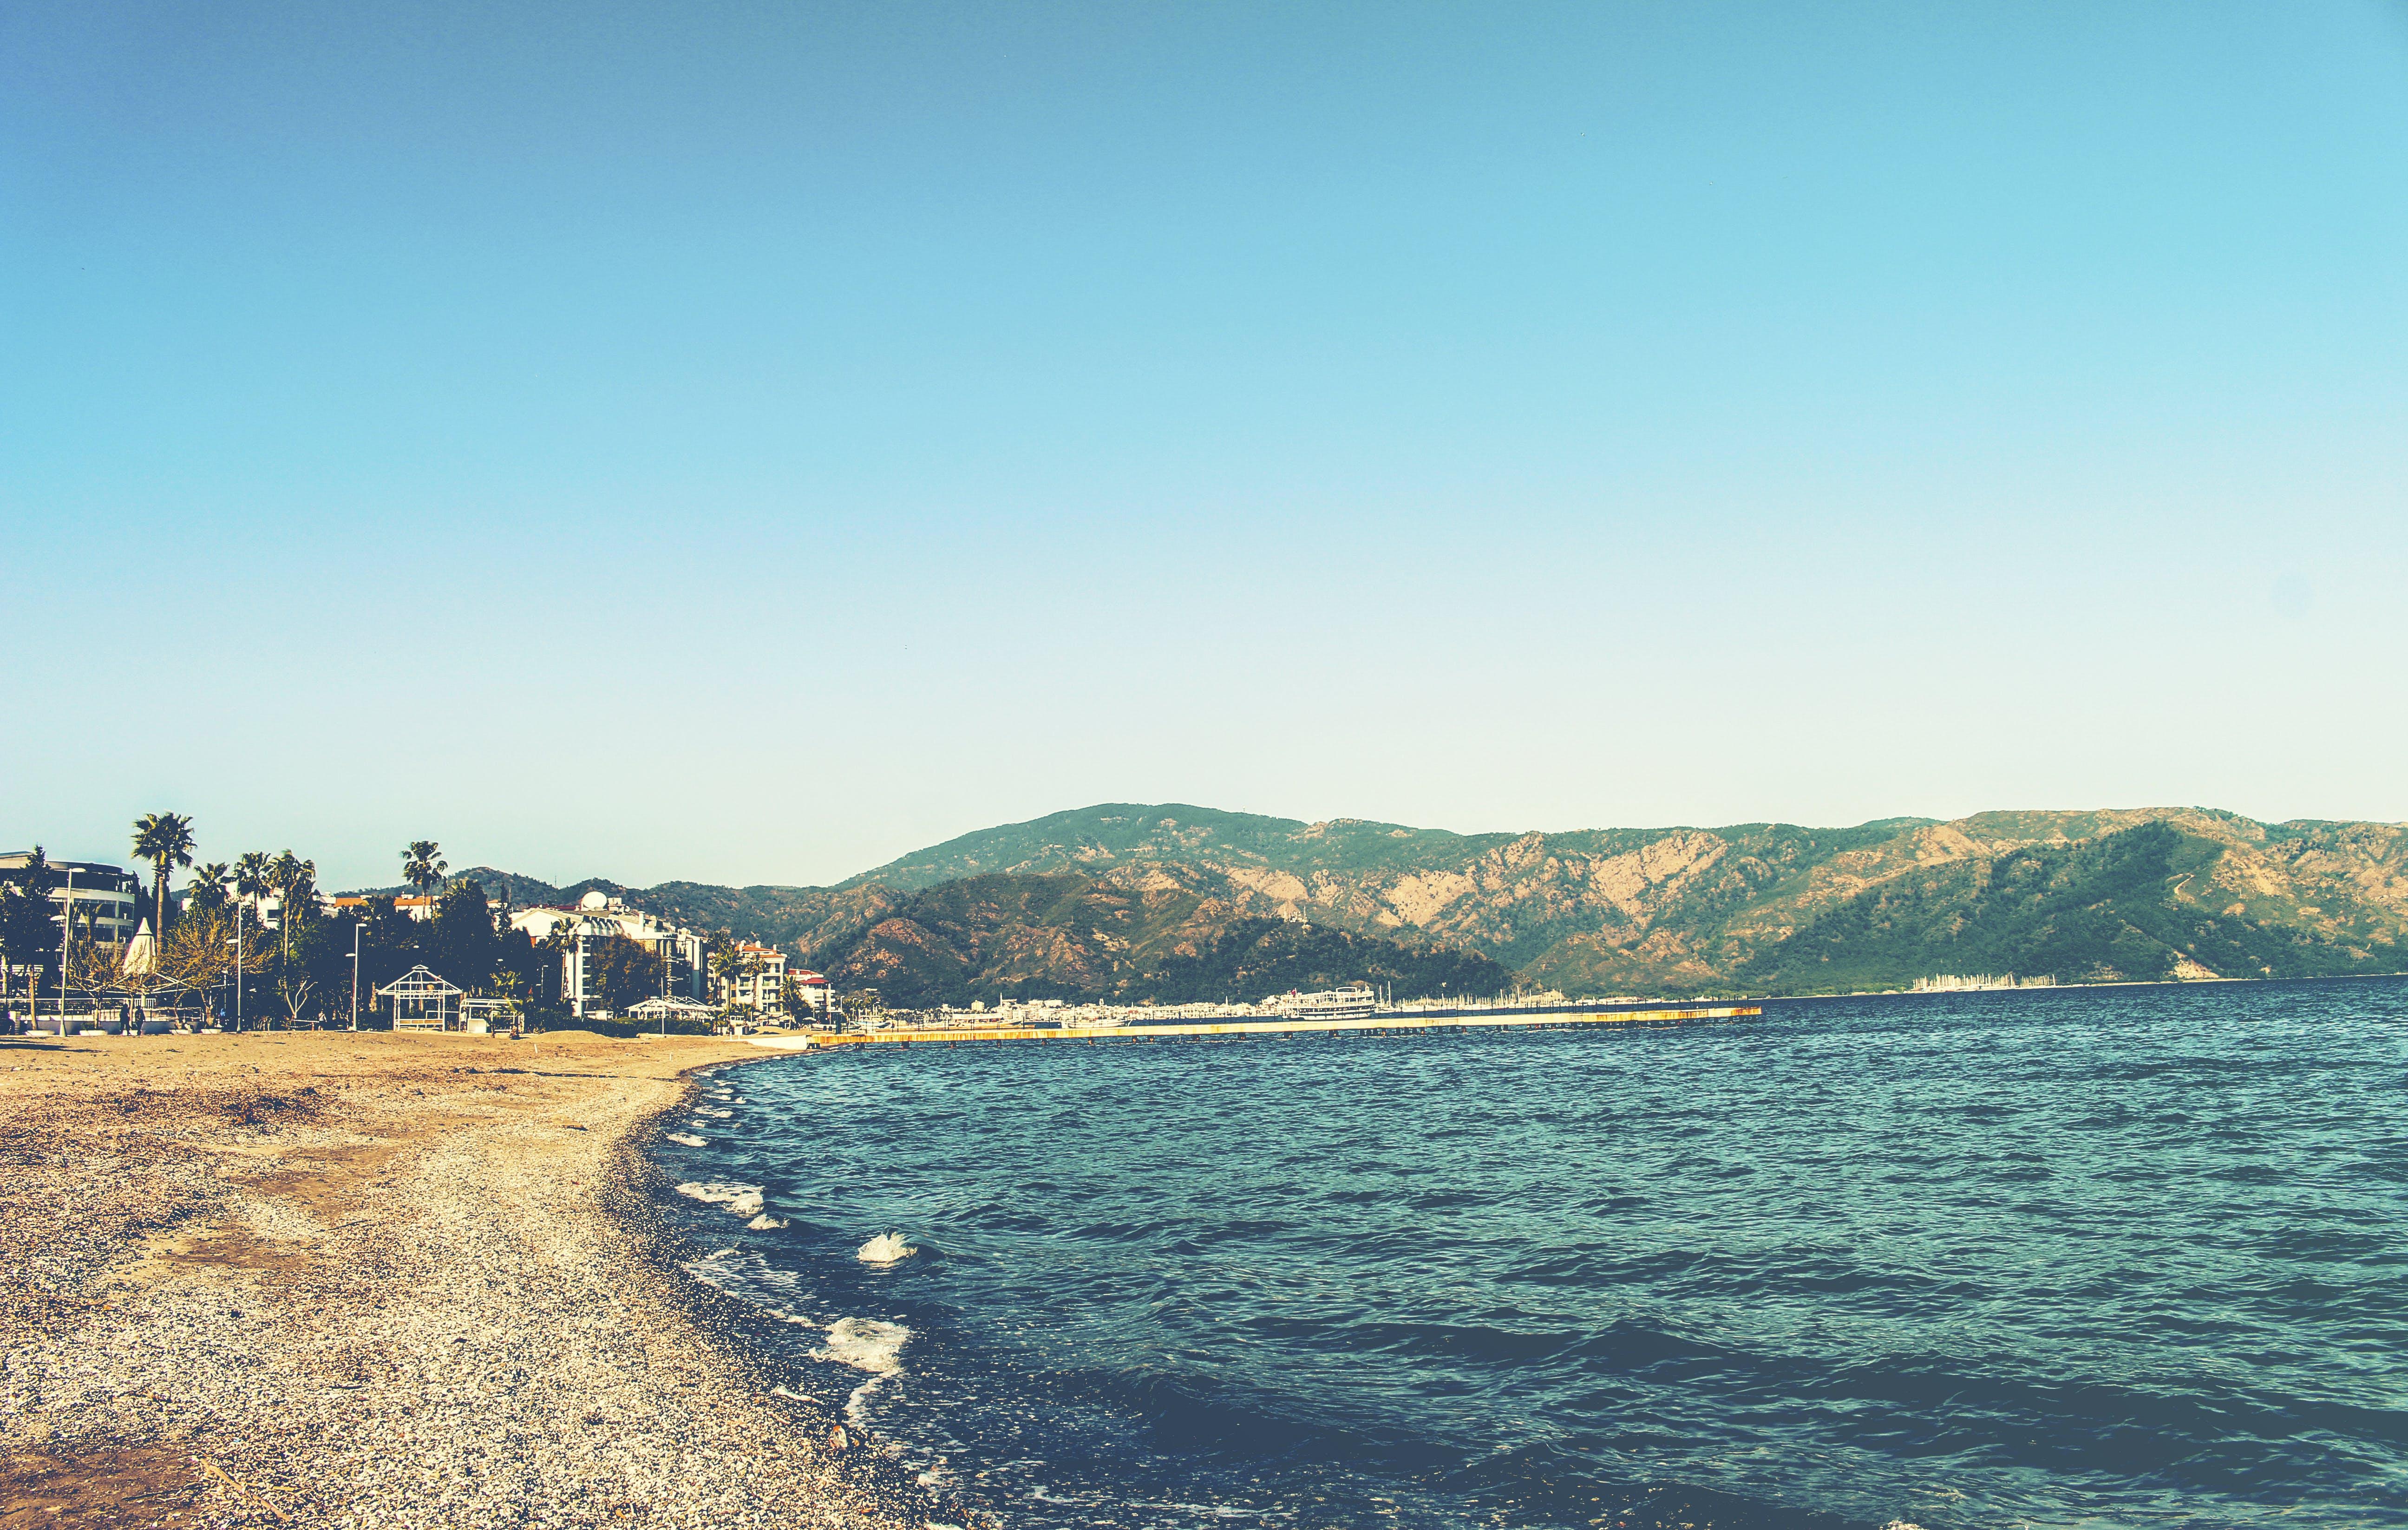 Seashore and Sea